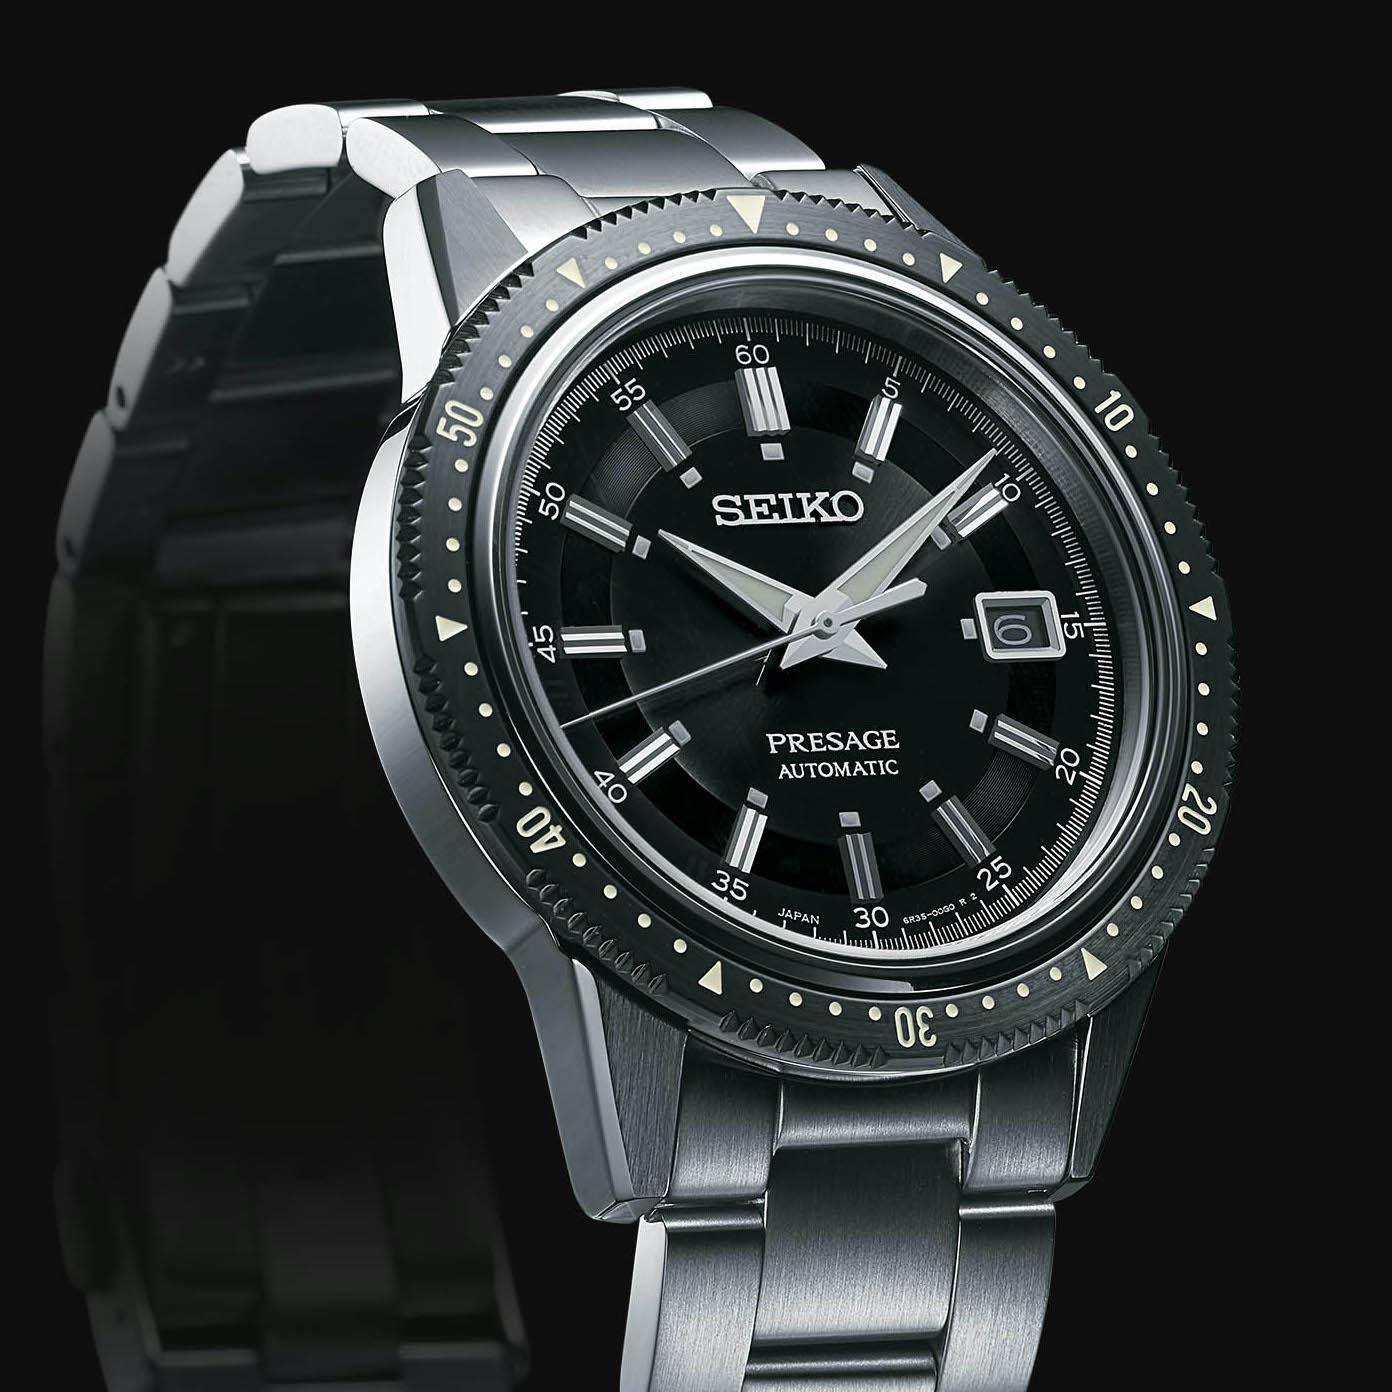 Seiko's new Presage 2020 Limited Edition Seiko-Presage-2020-Limited-Edition-SPB131J1-Tribute-1964-Crown-Chronograph-6